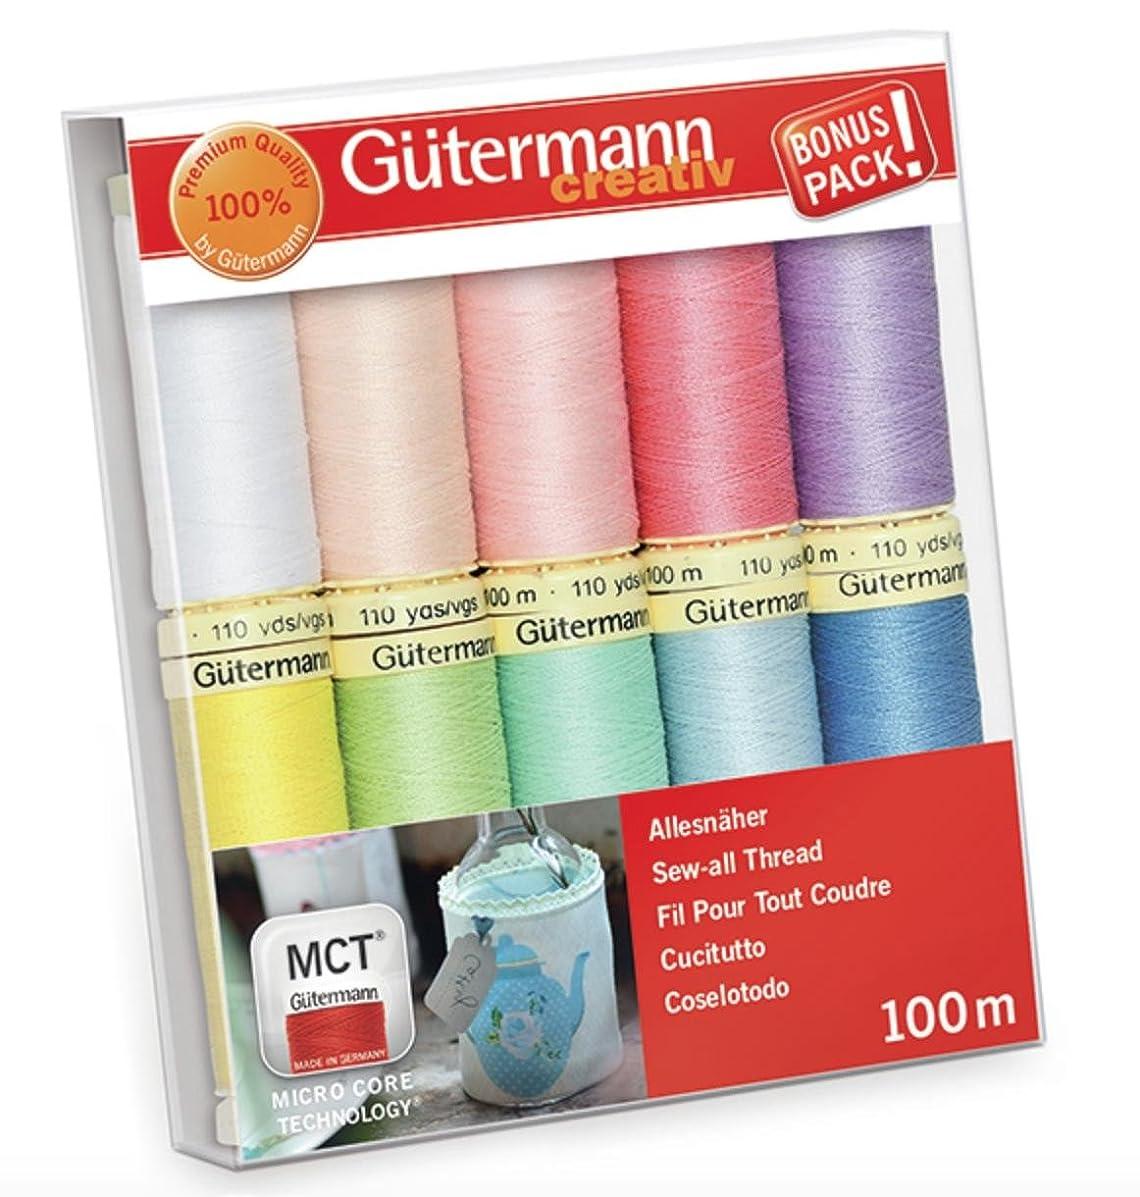 Gutermann Sew-All Pastels Set 100% Polyester Thread Set 10 x 100m Reels